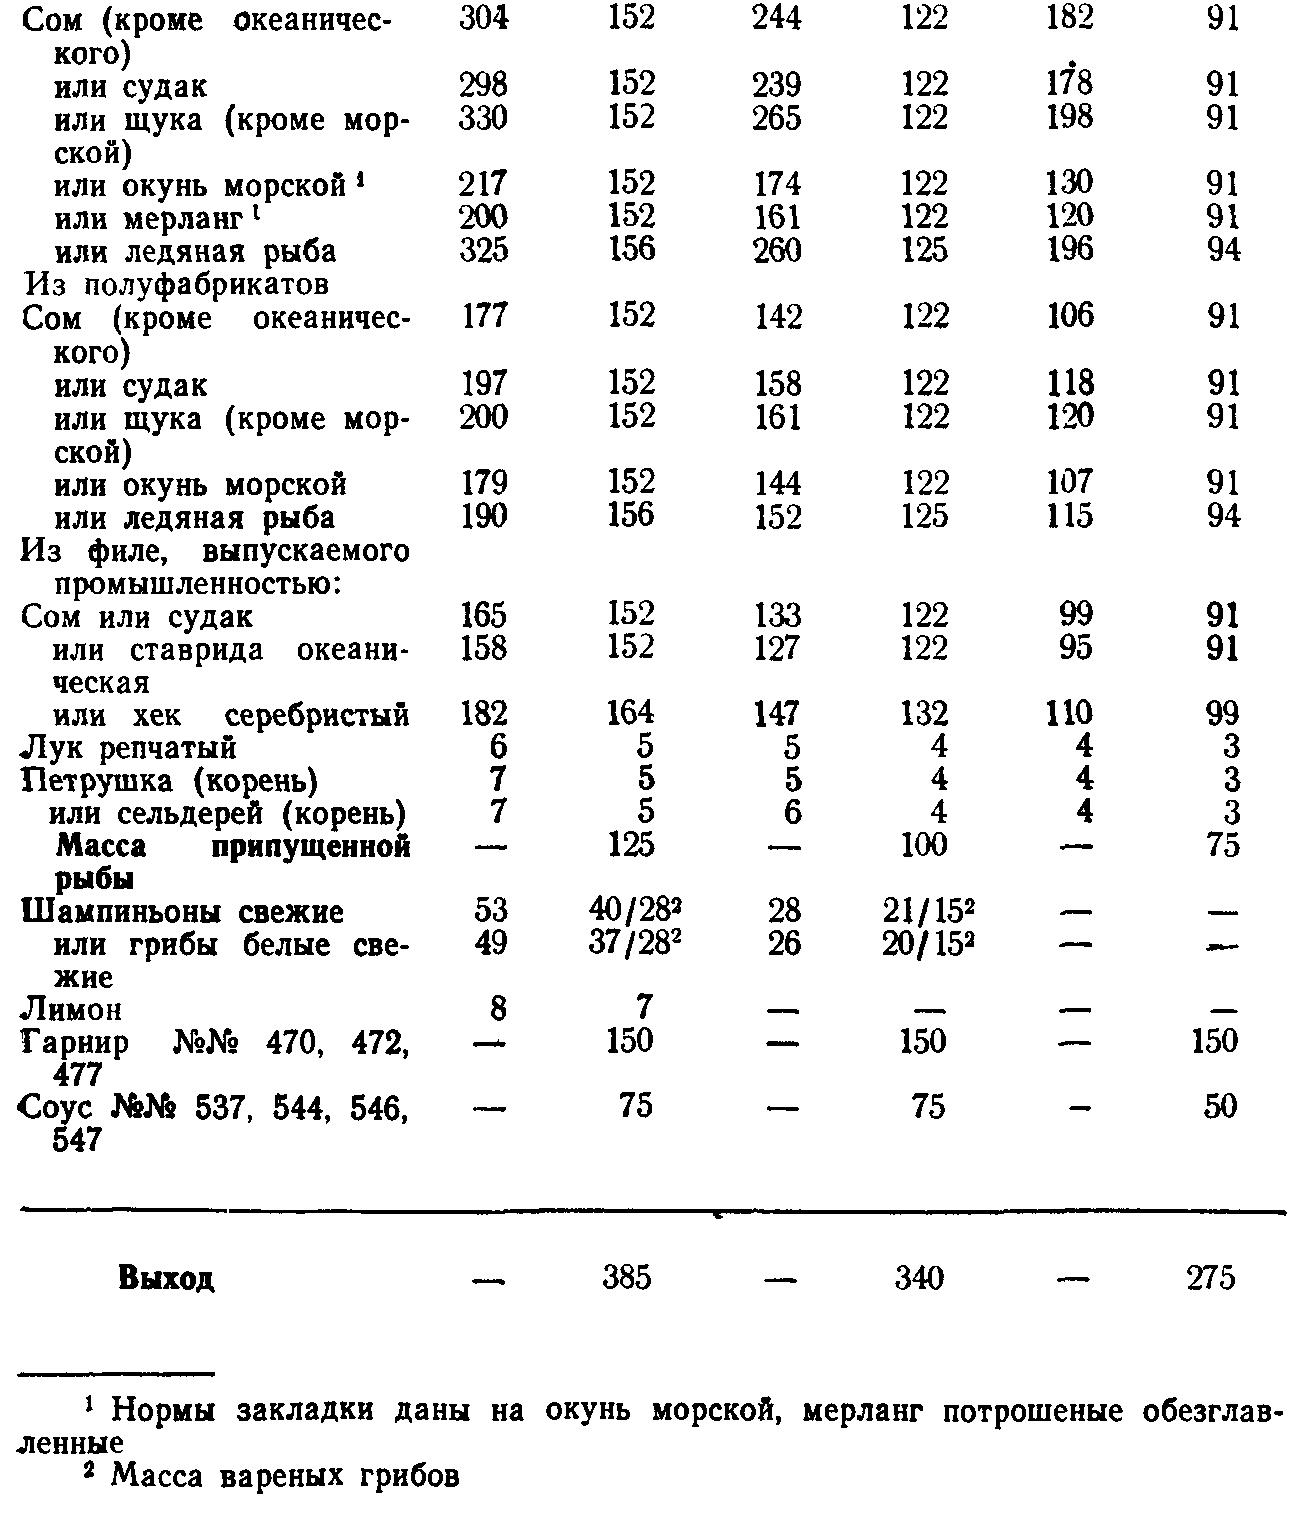 Рыба филе припущенная (ТТК5654)